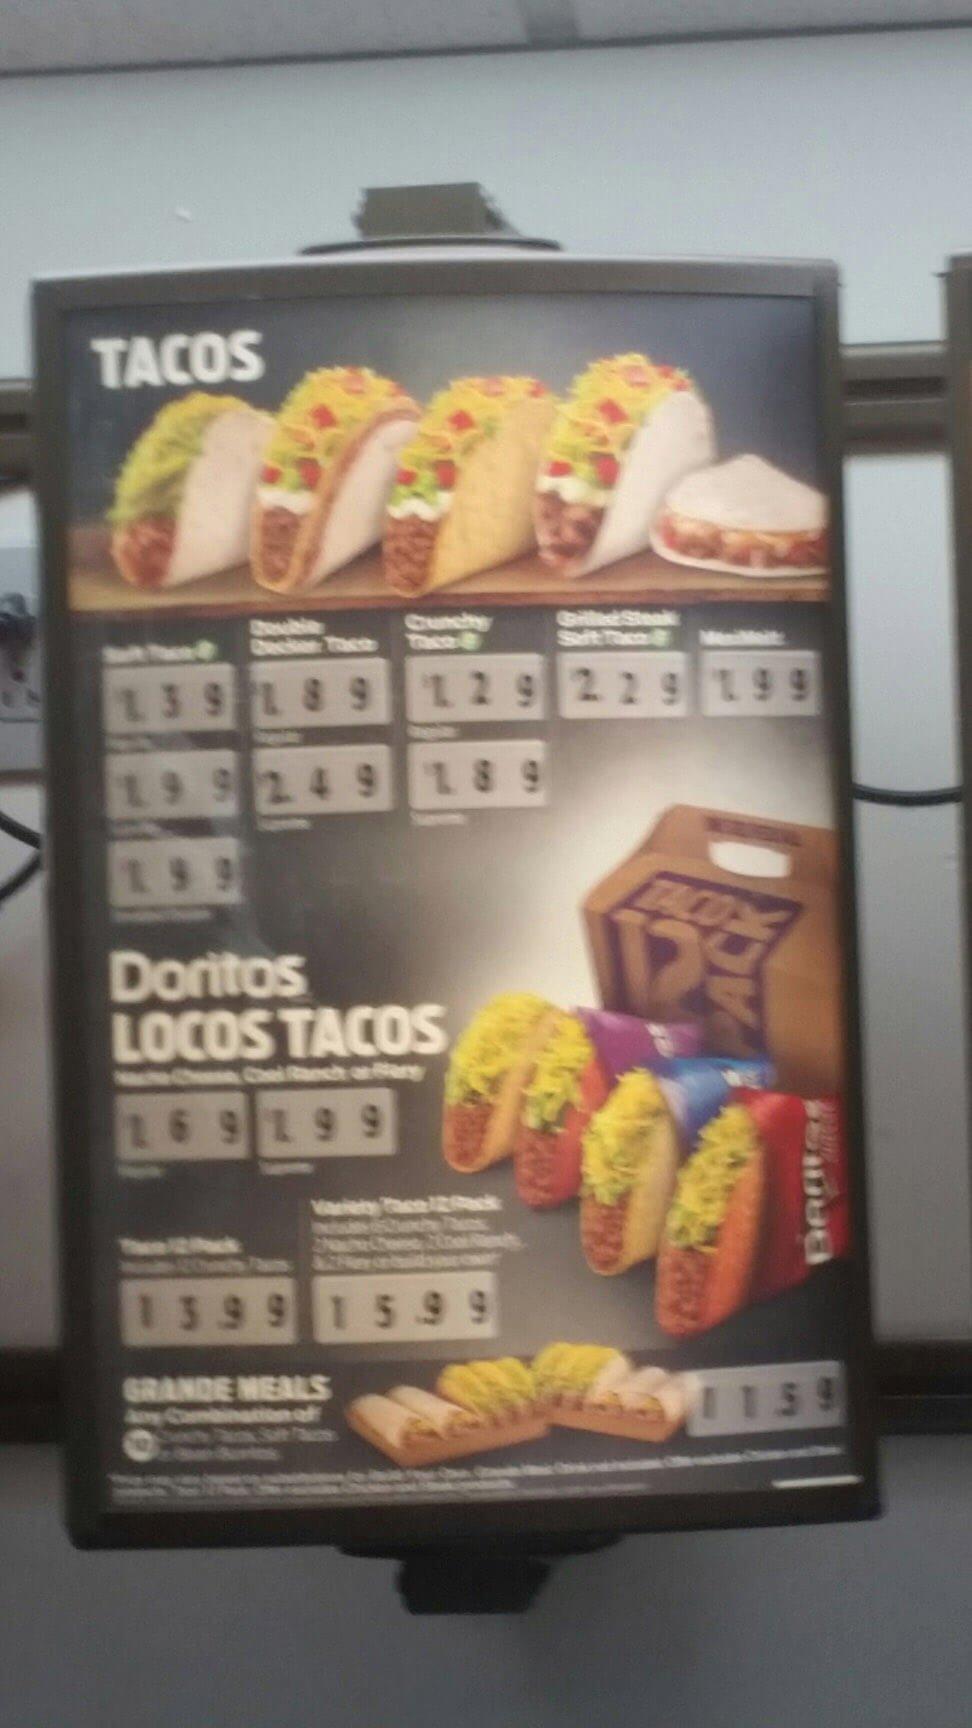 Taco Bell Menu – 9